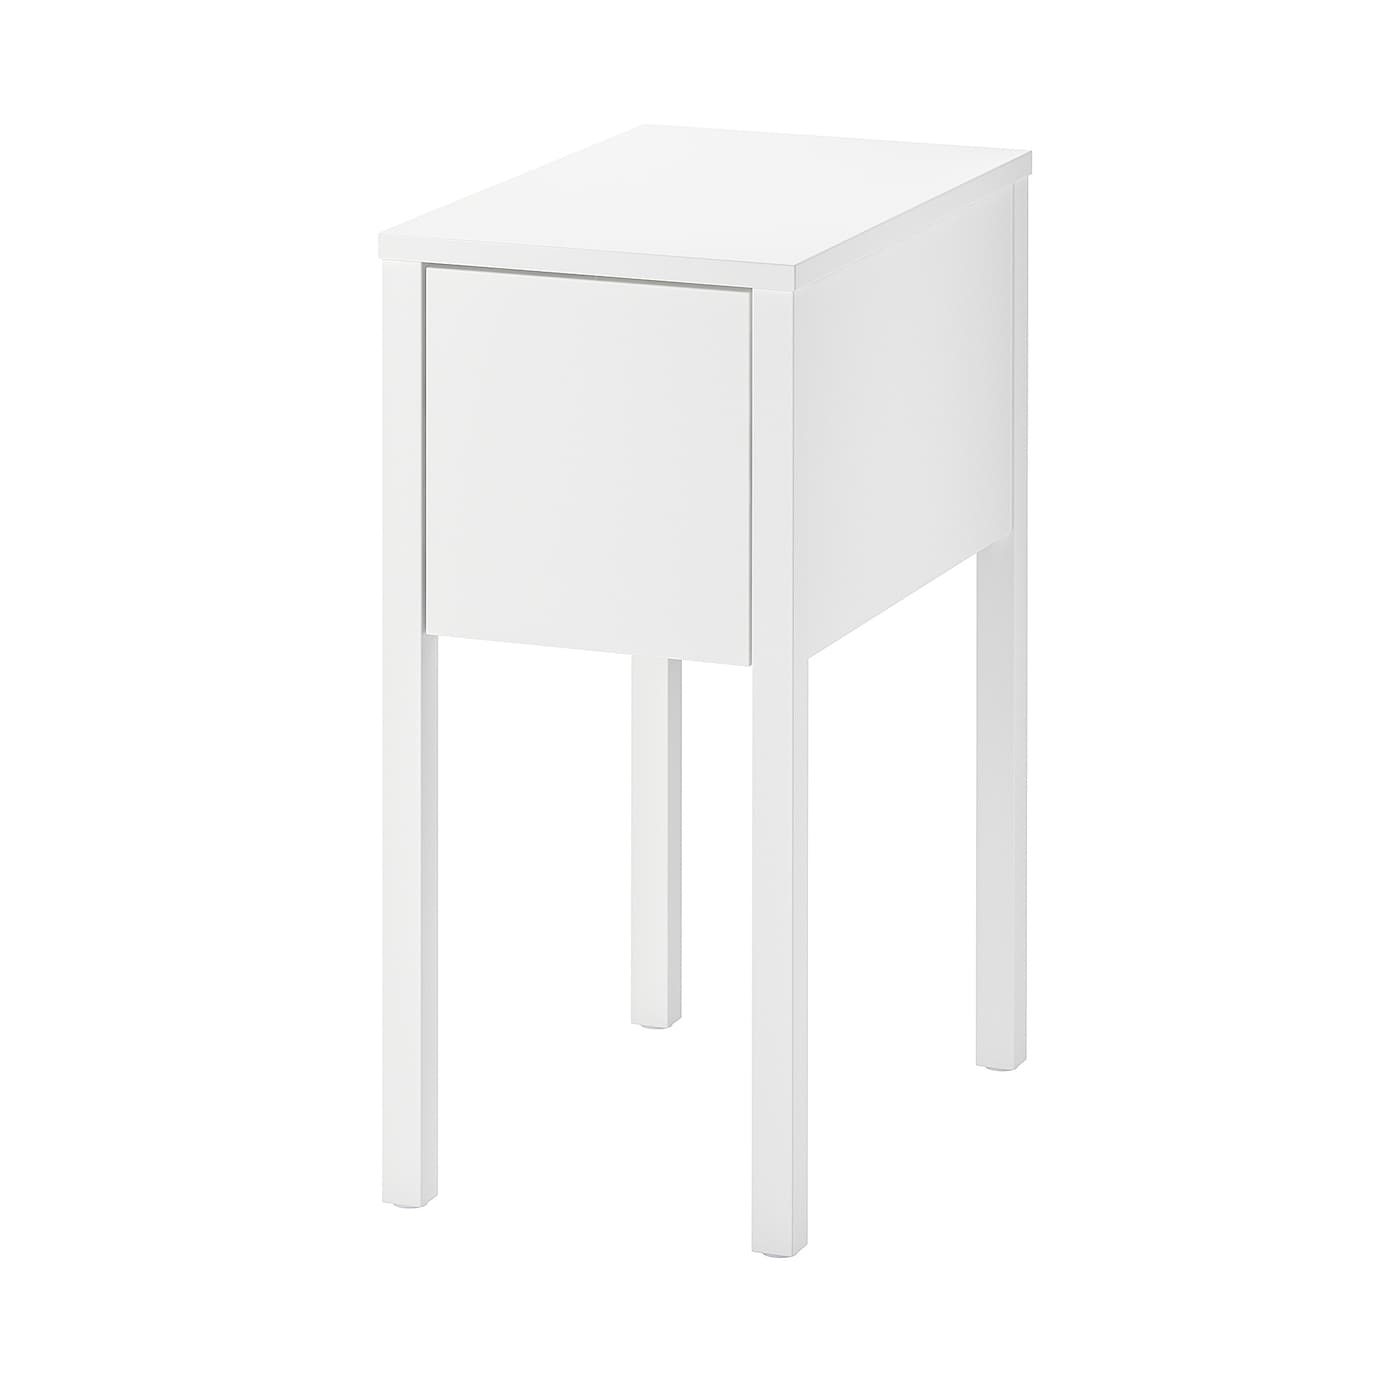 Nordli Table De Chevet Blanc 30 X 50 Cm Ikea